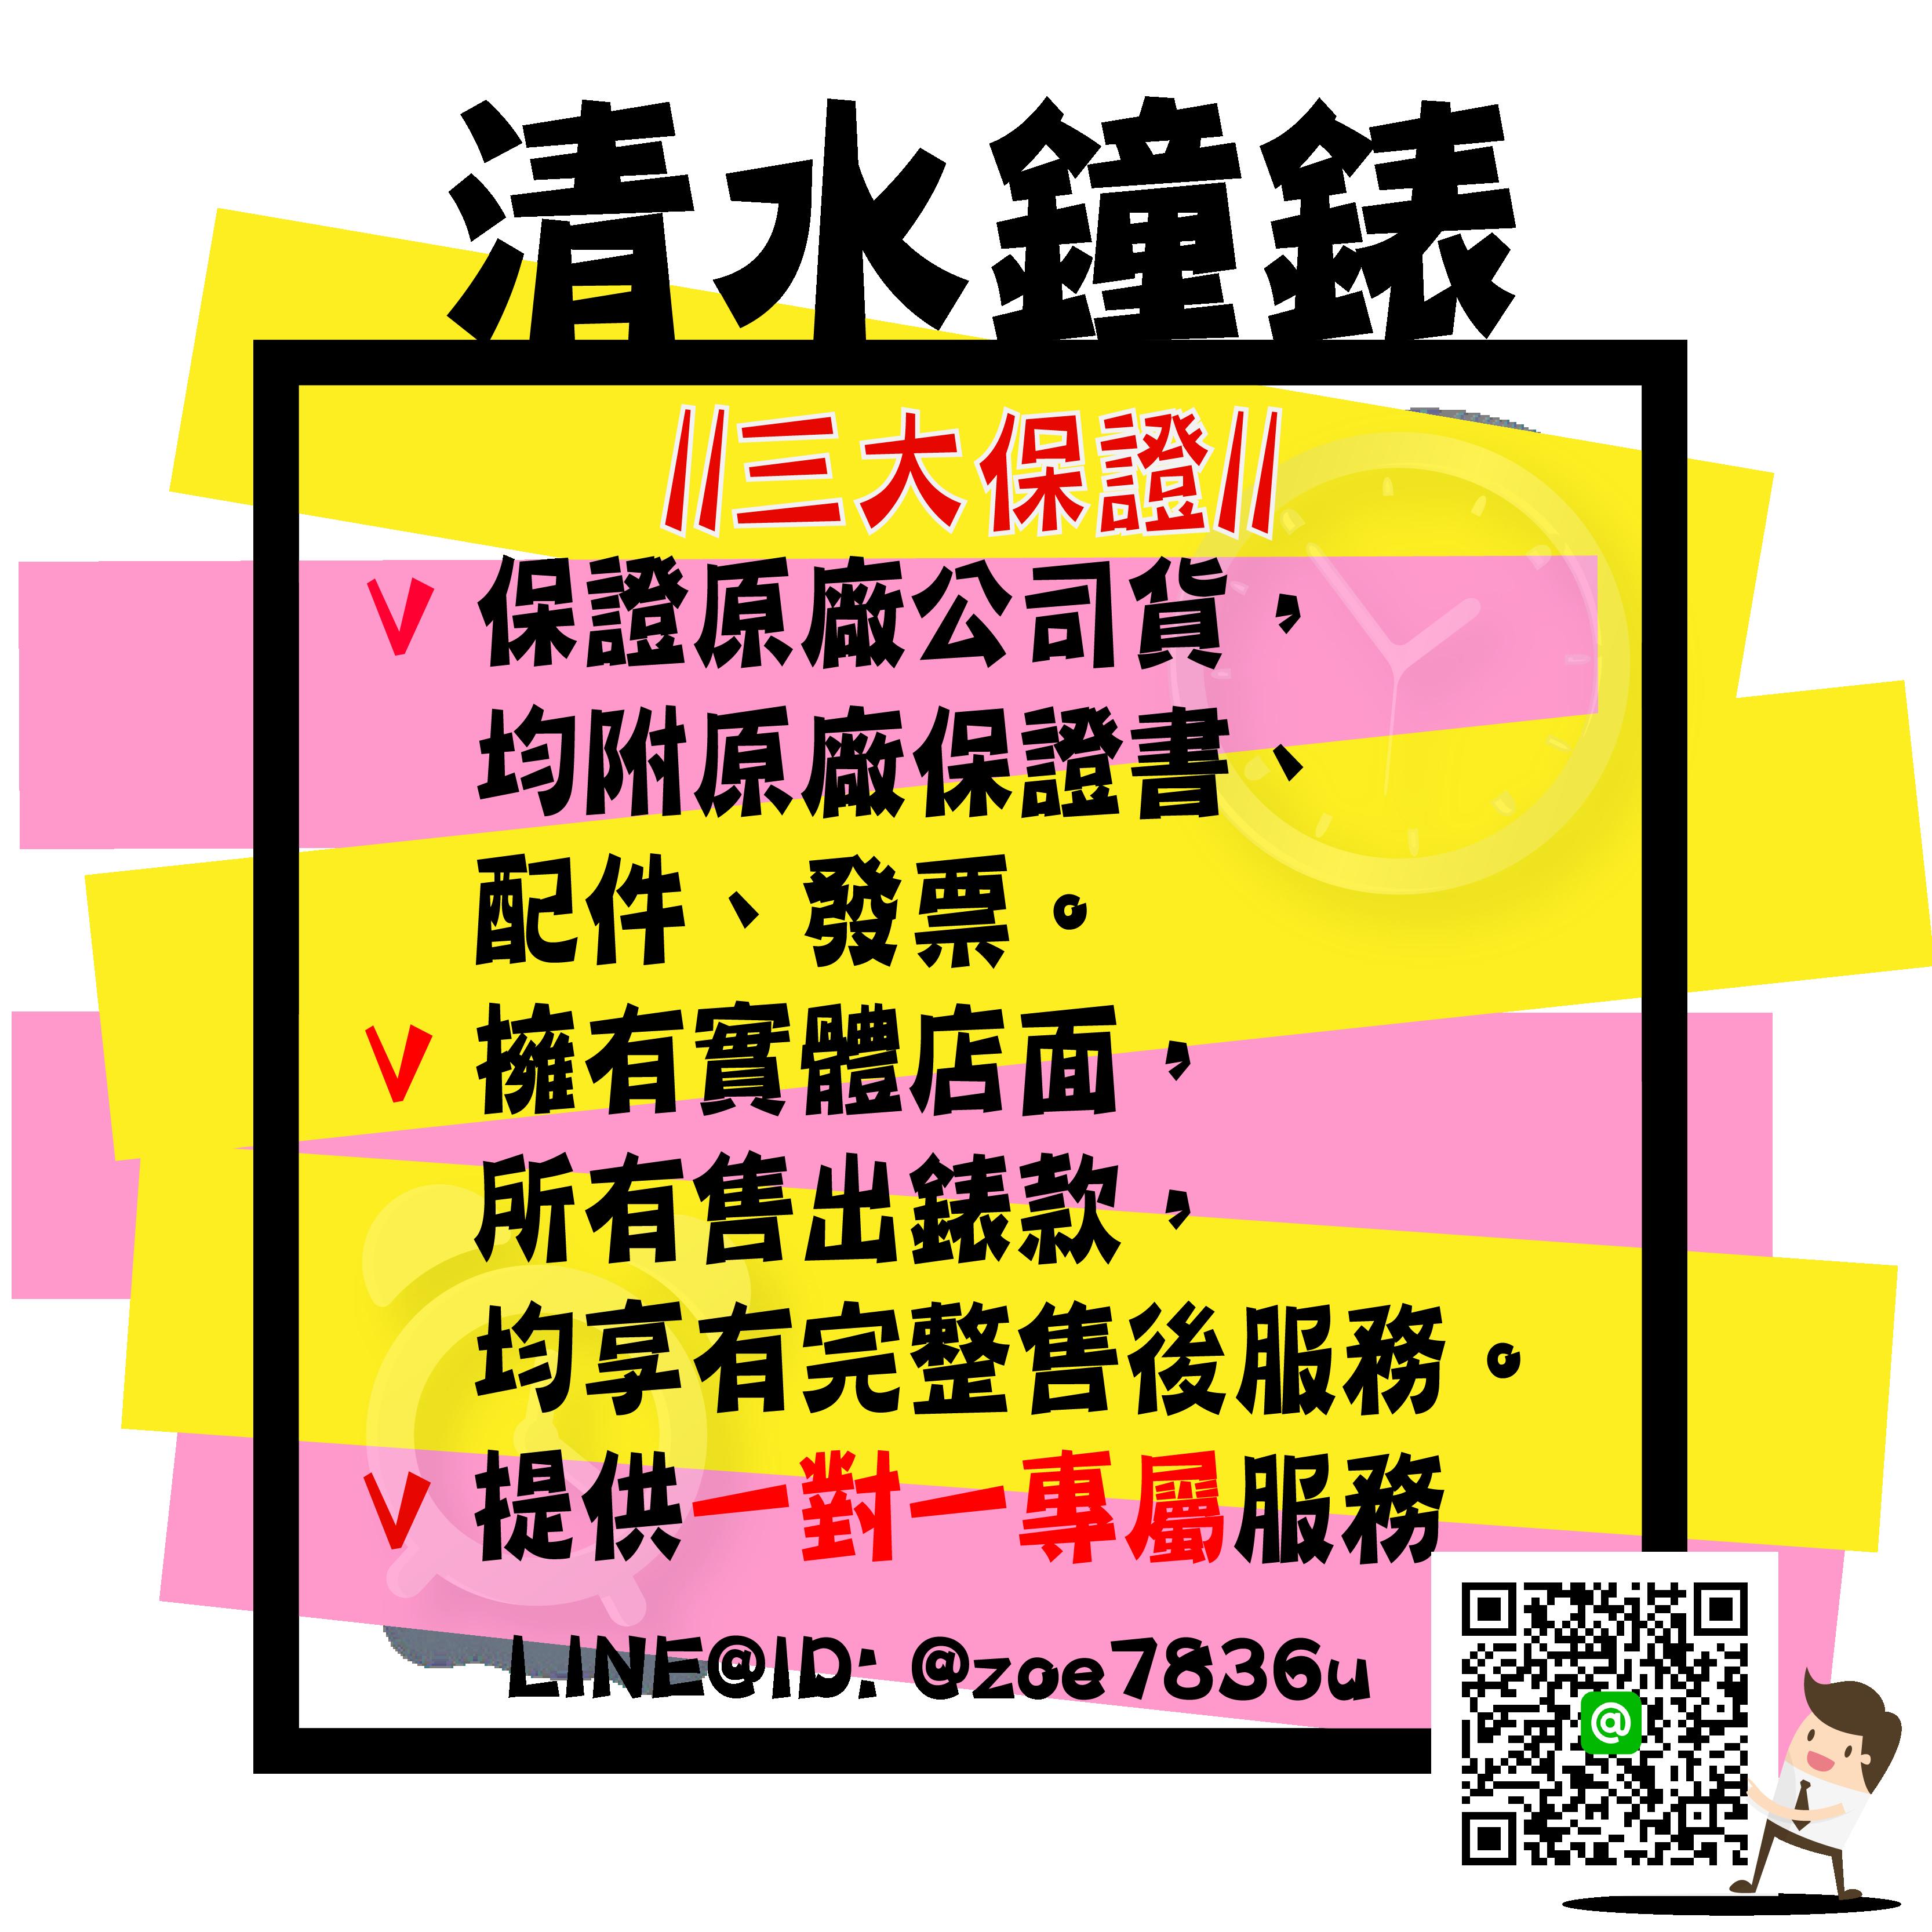 CASIO 卡西歐 BGA-230PC-2B Baby-G 春天活力運動女錶 水藍 粉紅 42.9mm